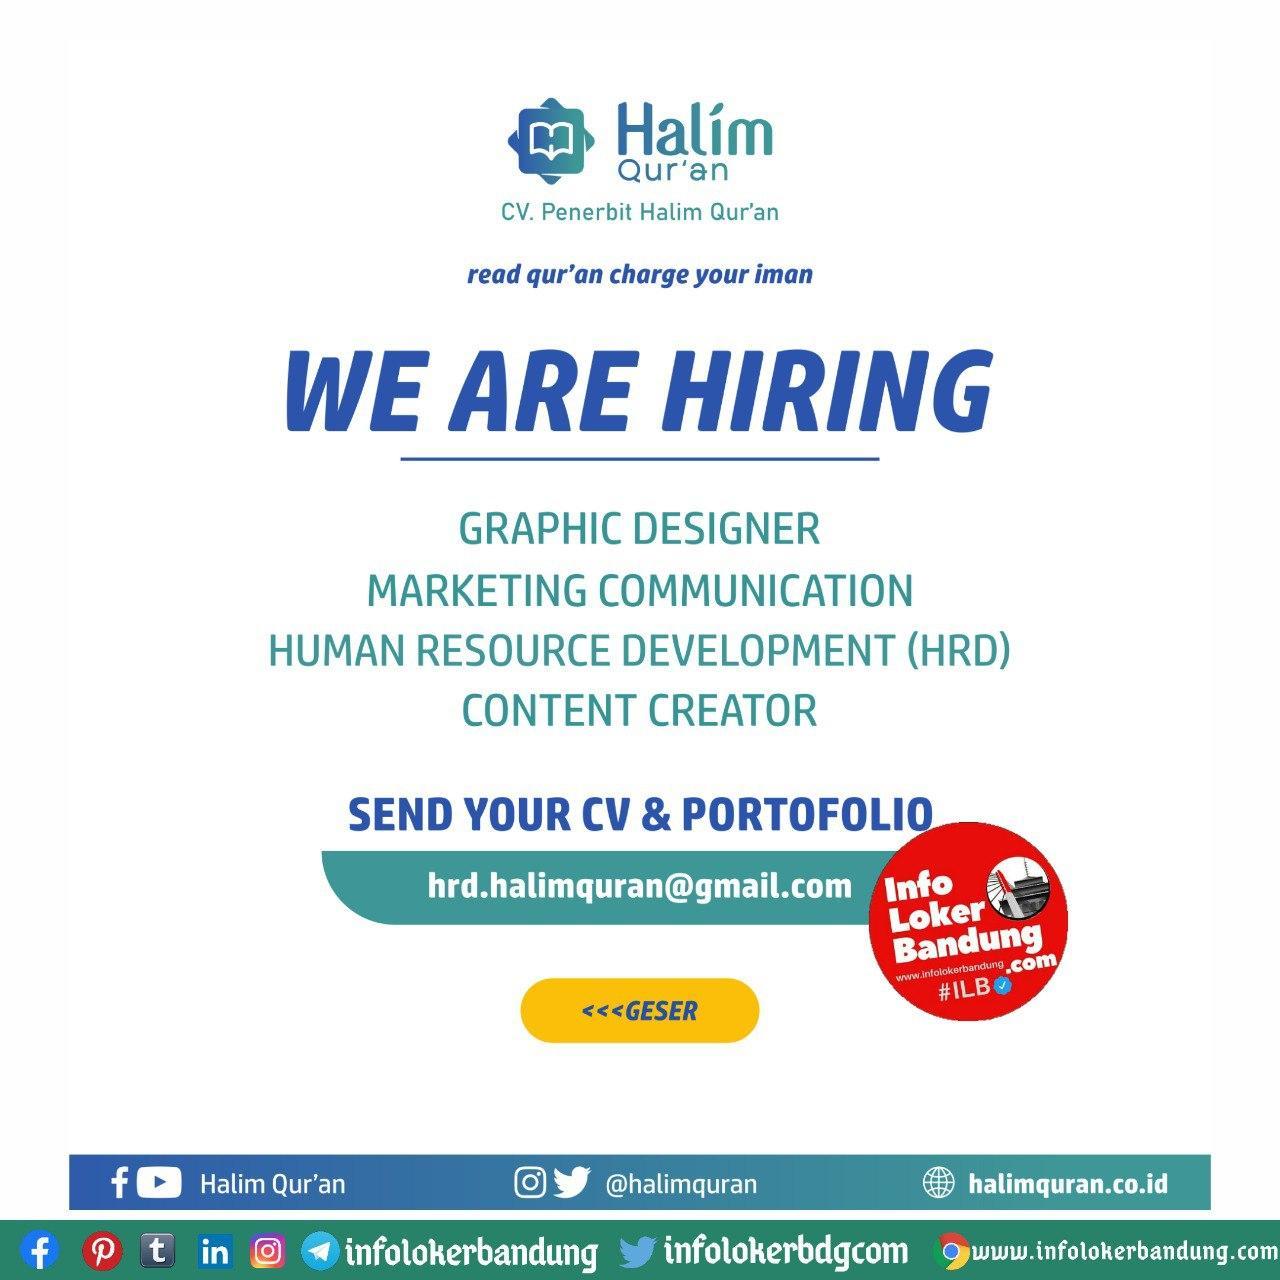 Lowongan Kerja CV. Penerbit Halim Quran Bandung Oktober 2020